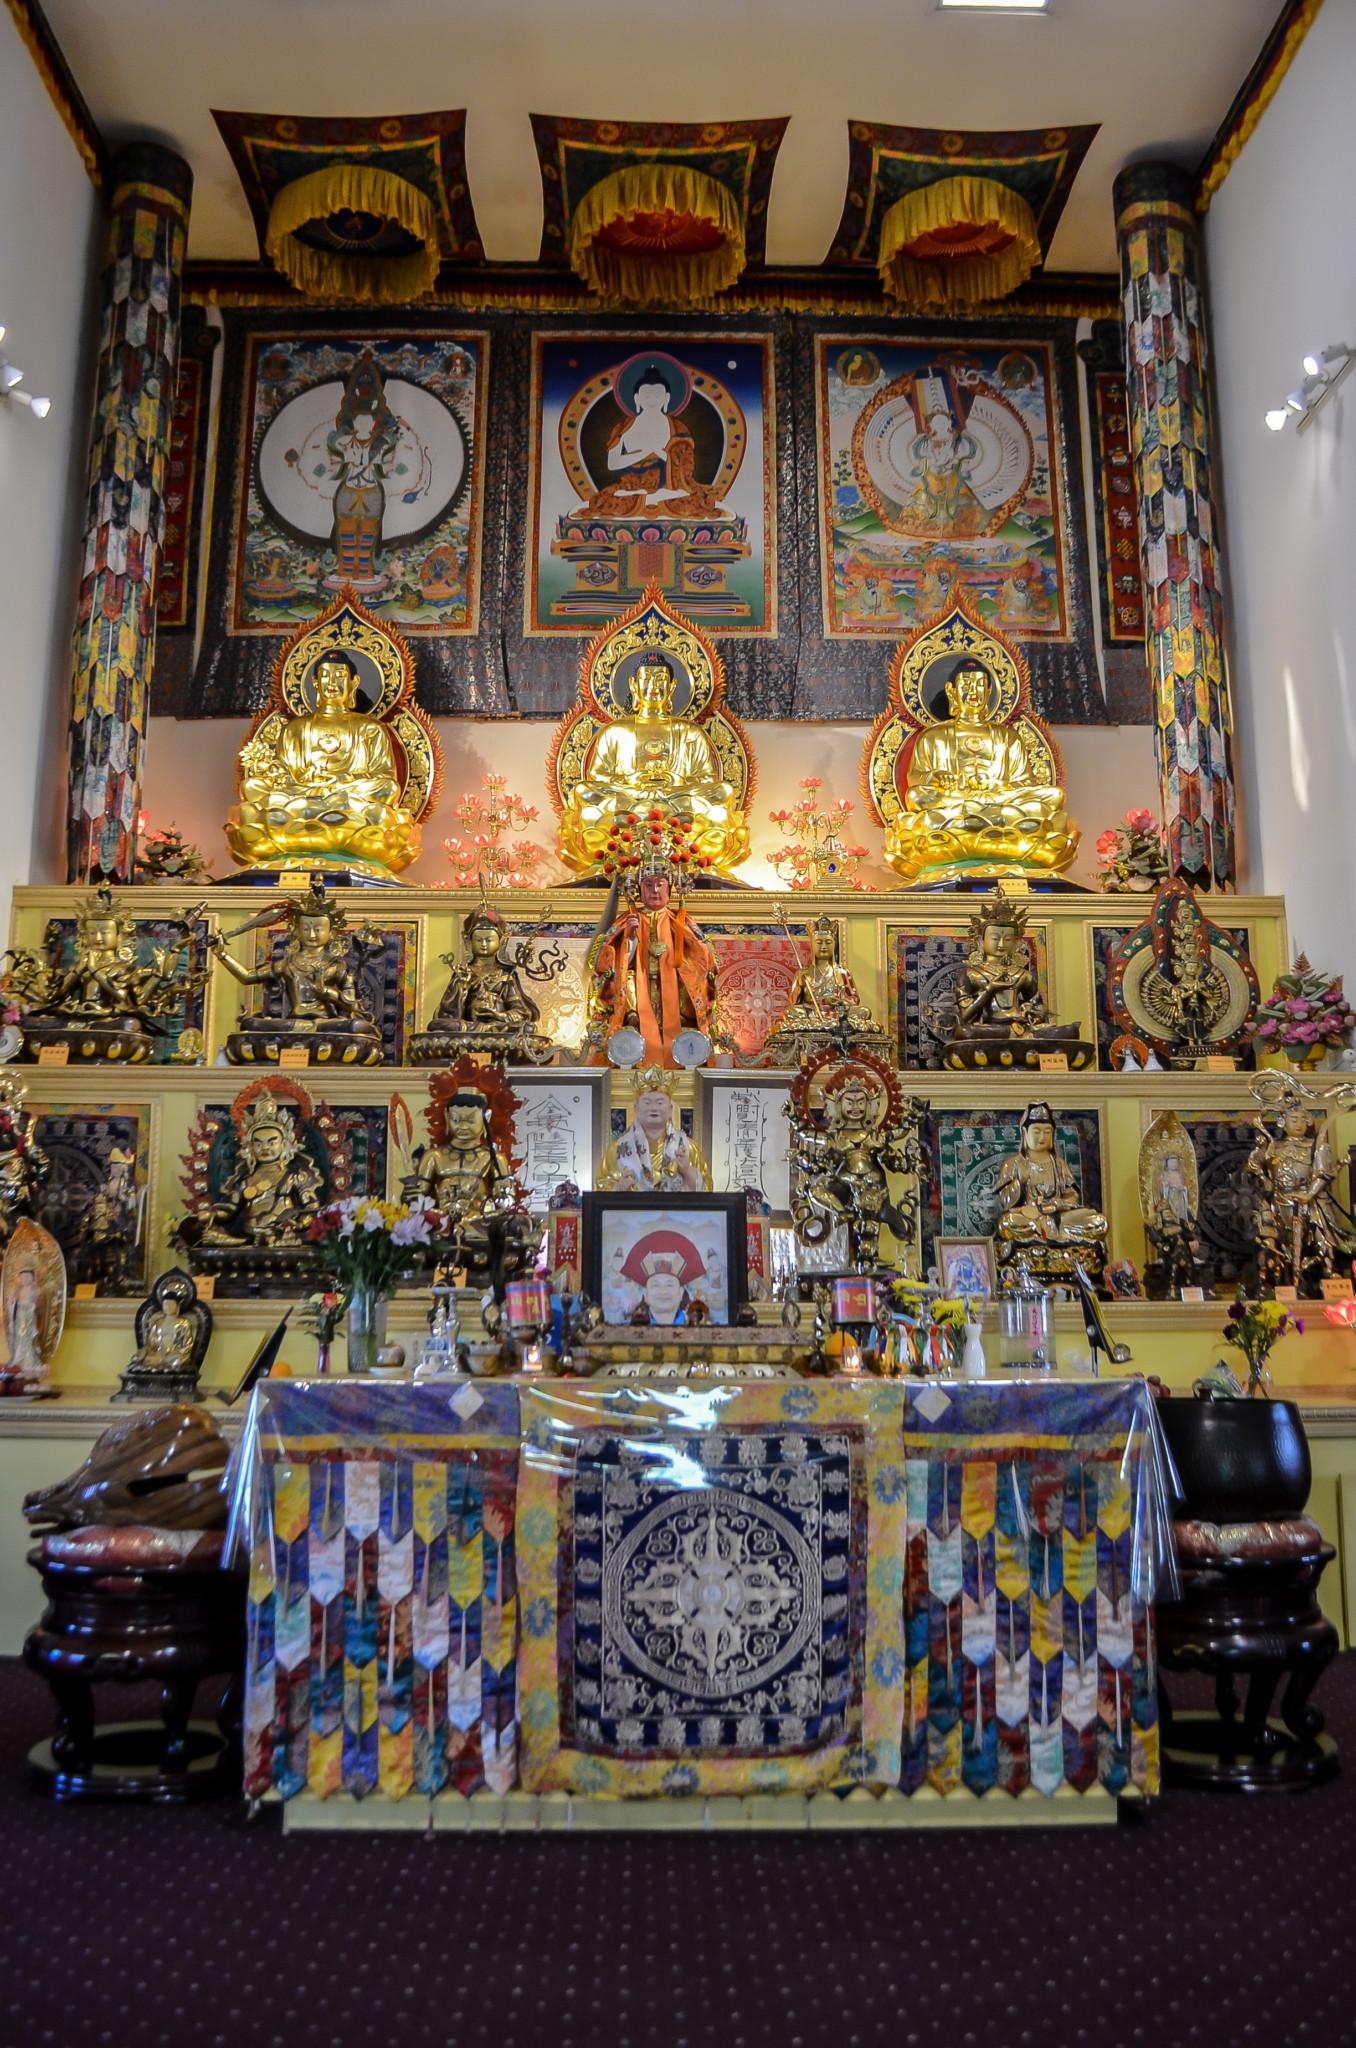 Ling Shen Ching Tze Buddhist Temple, 1035 W. 31st St. (Bridget Vaughn)